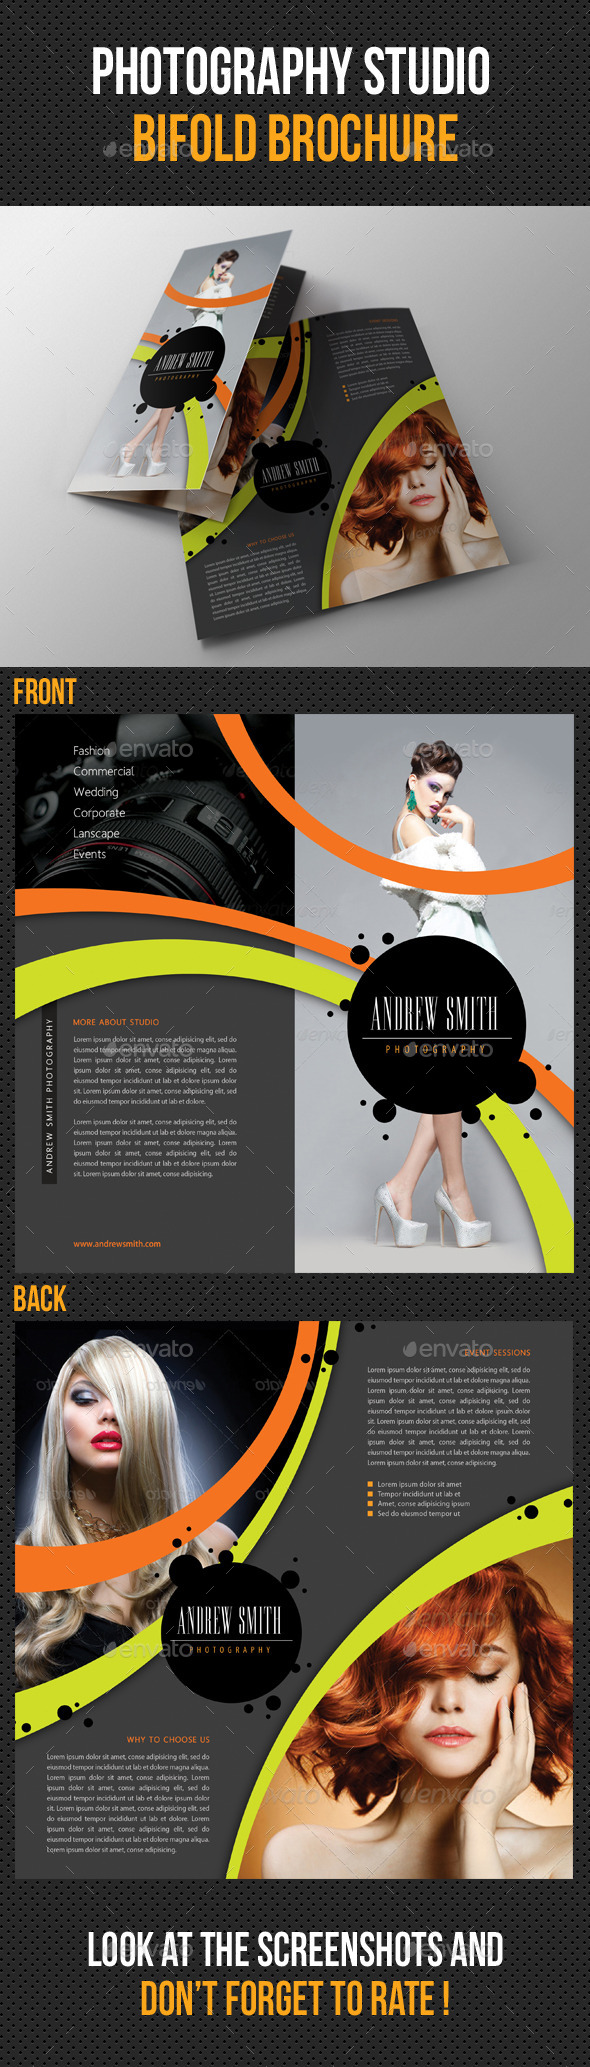 Photography Studio Bifold Brochure 04 - Portfolio Brochures